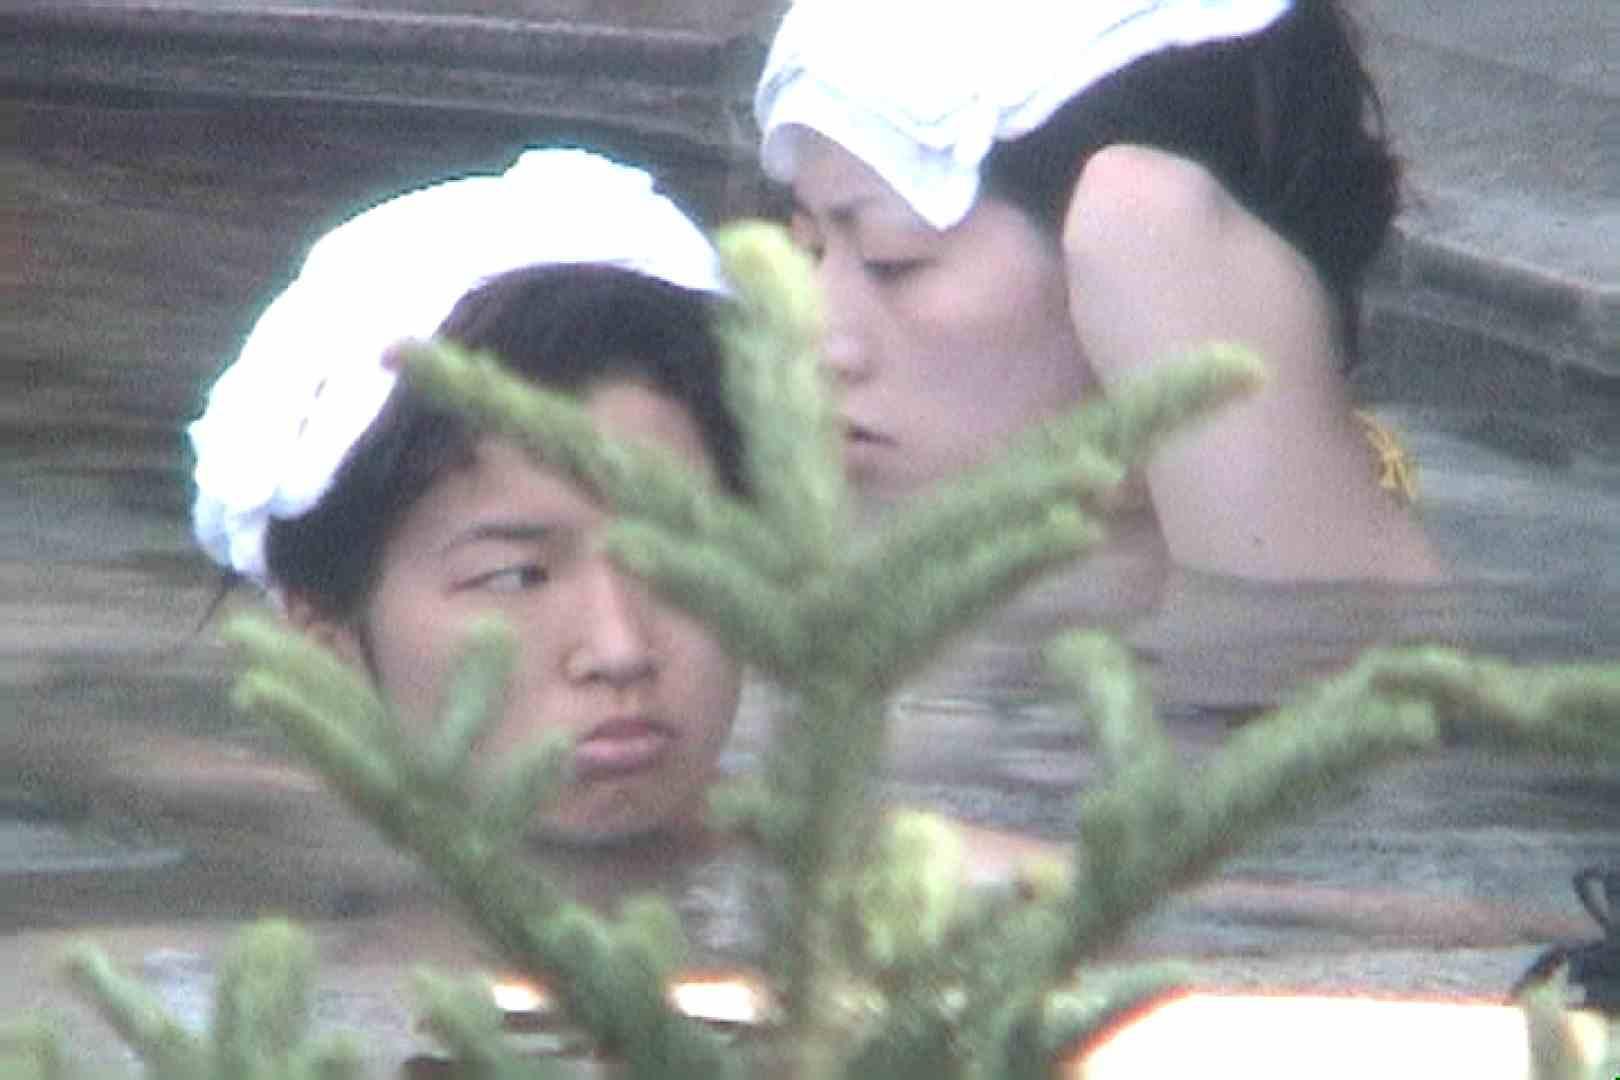 Aquaな露天風呂Vol.80【VIP限定】 露天風呂編   盗撮シリーズ  76PIX 11